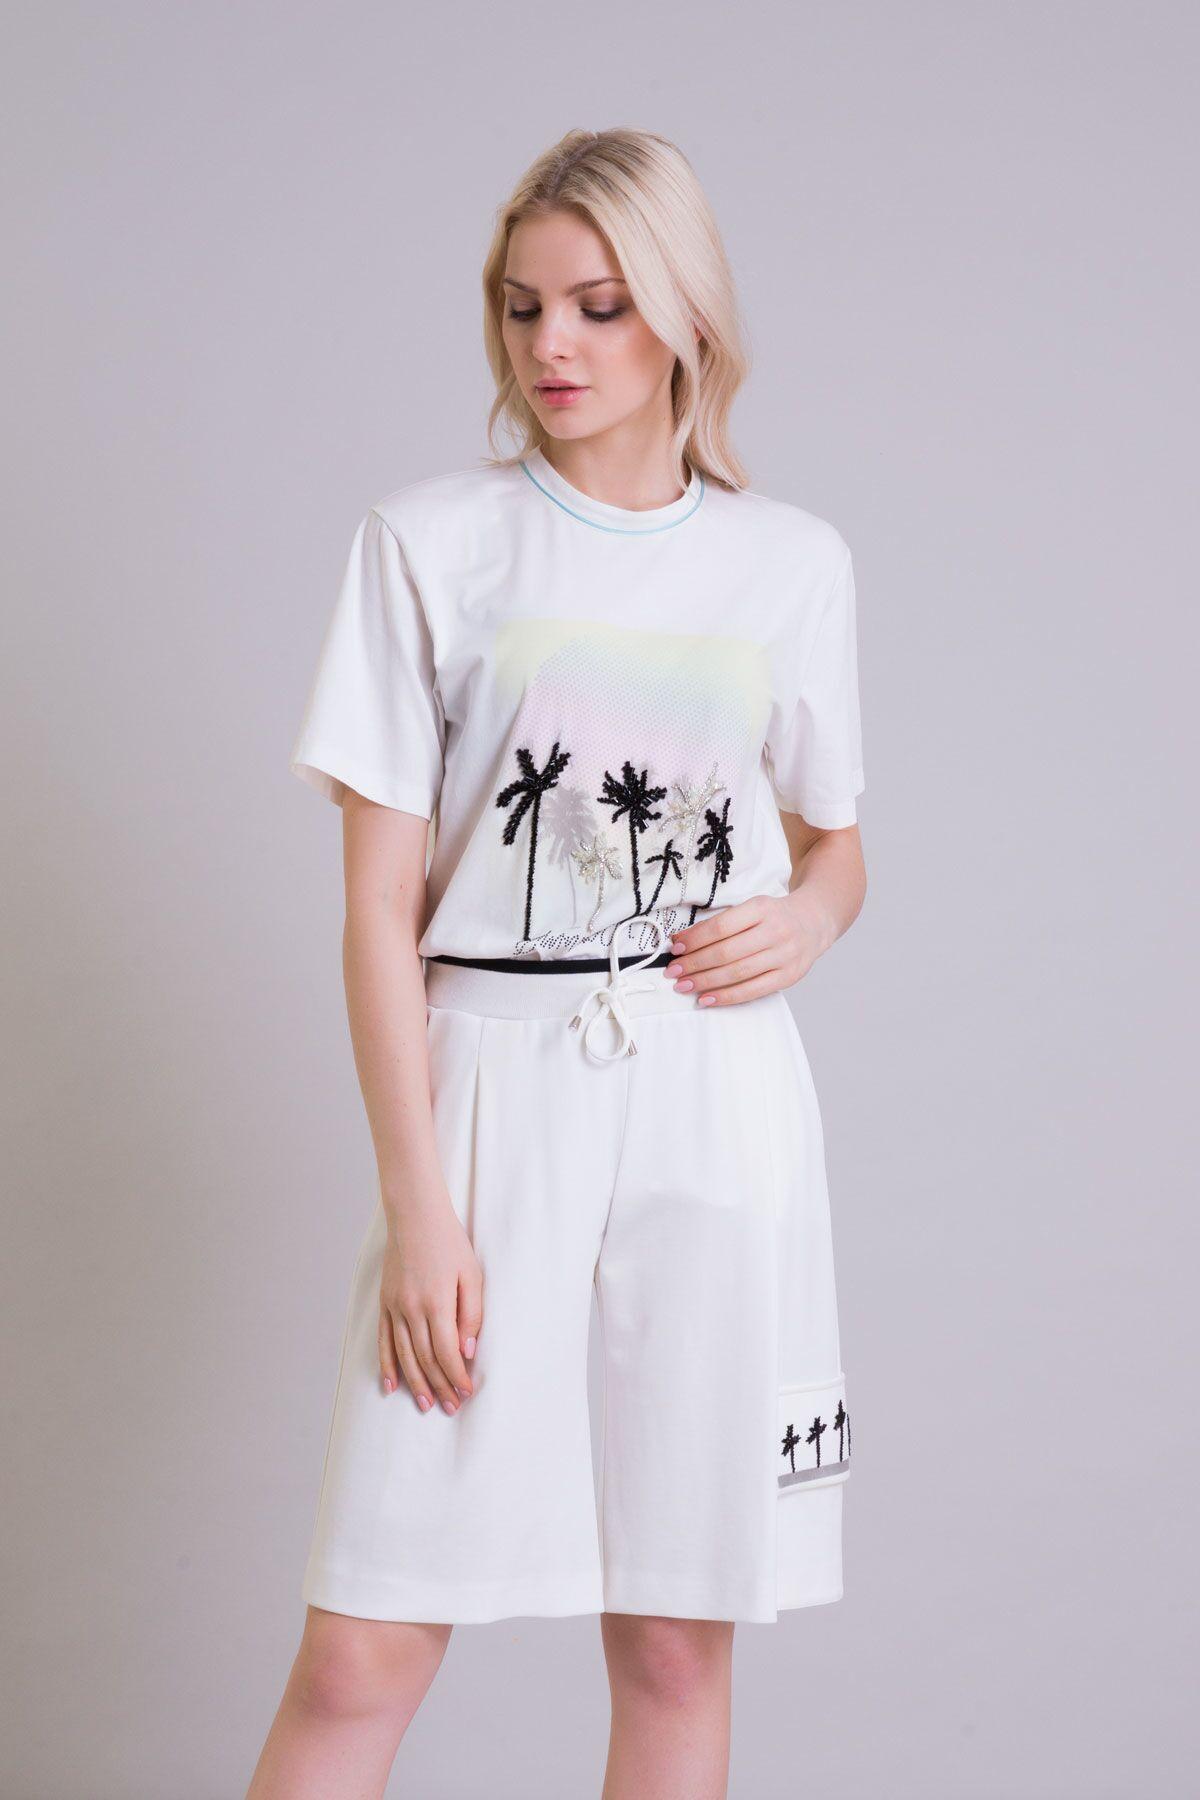 Palmiye Baskı Detaylı Ekru T-shirt